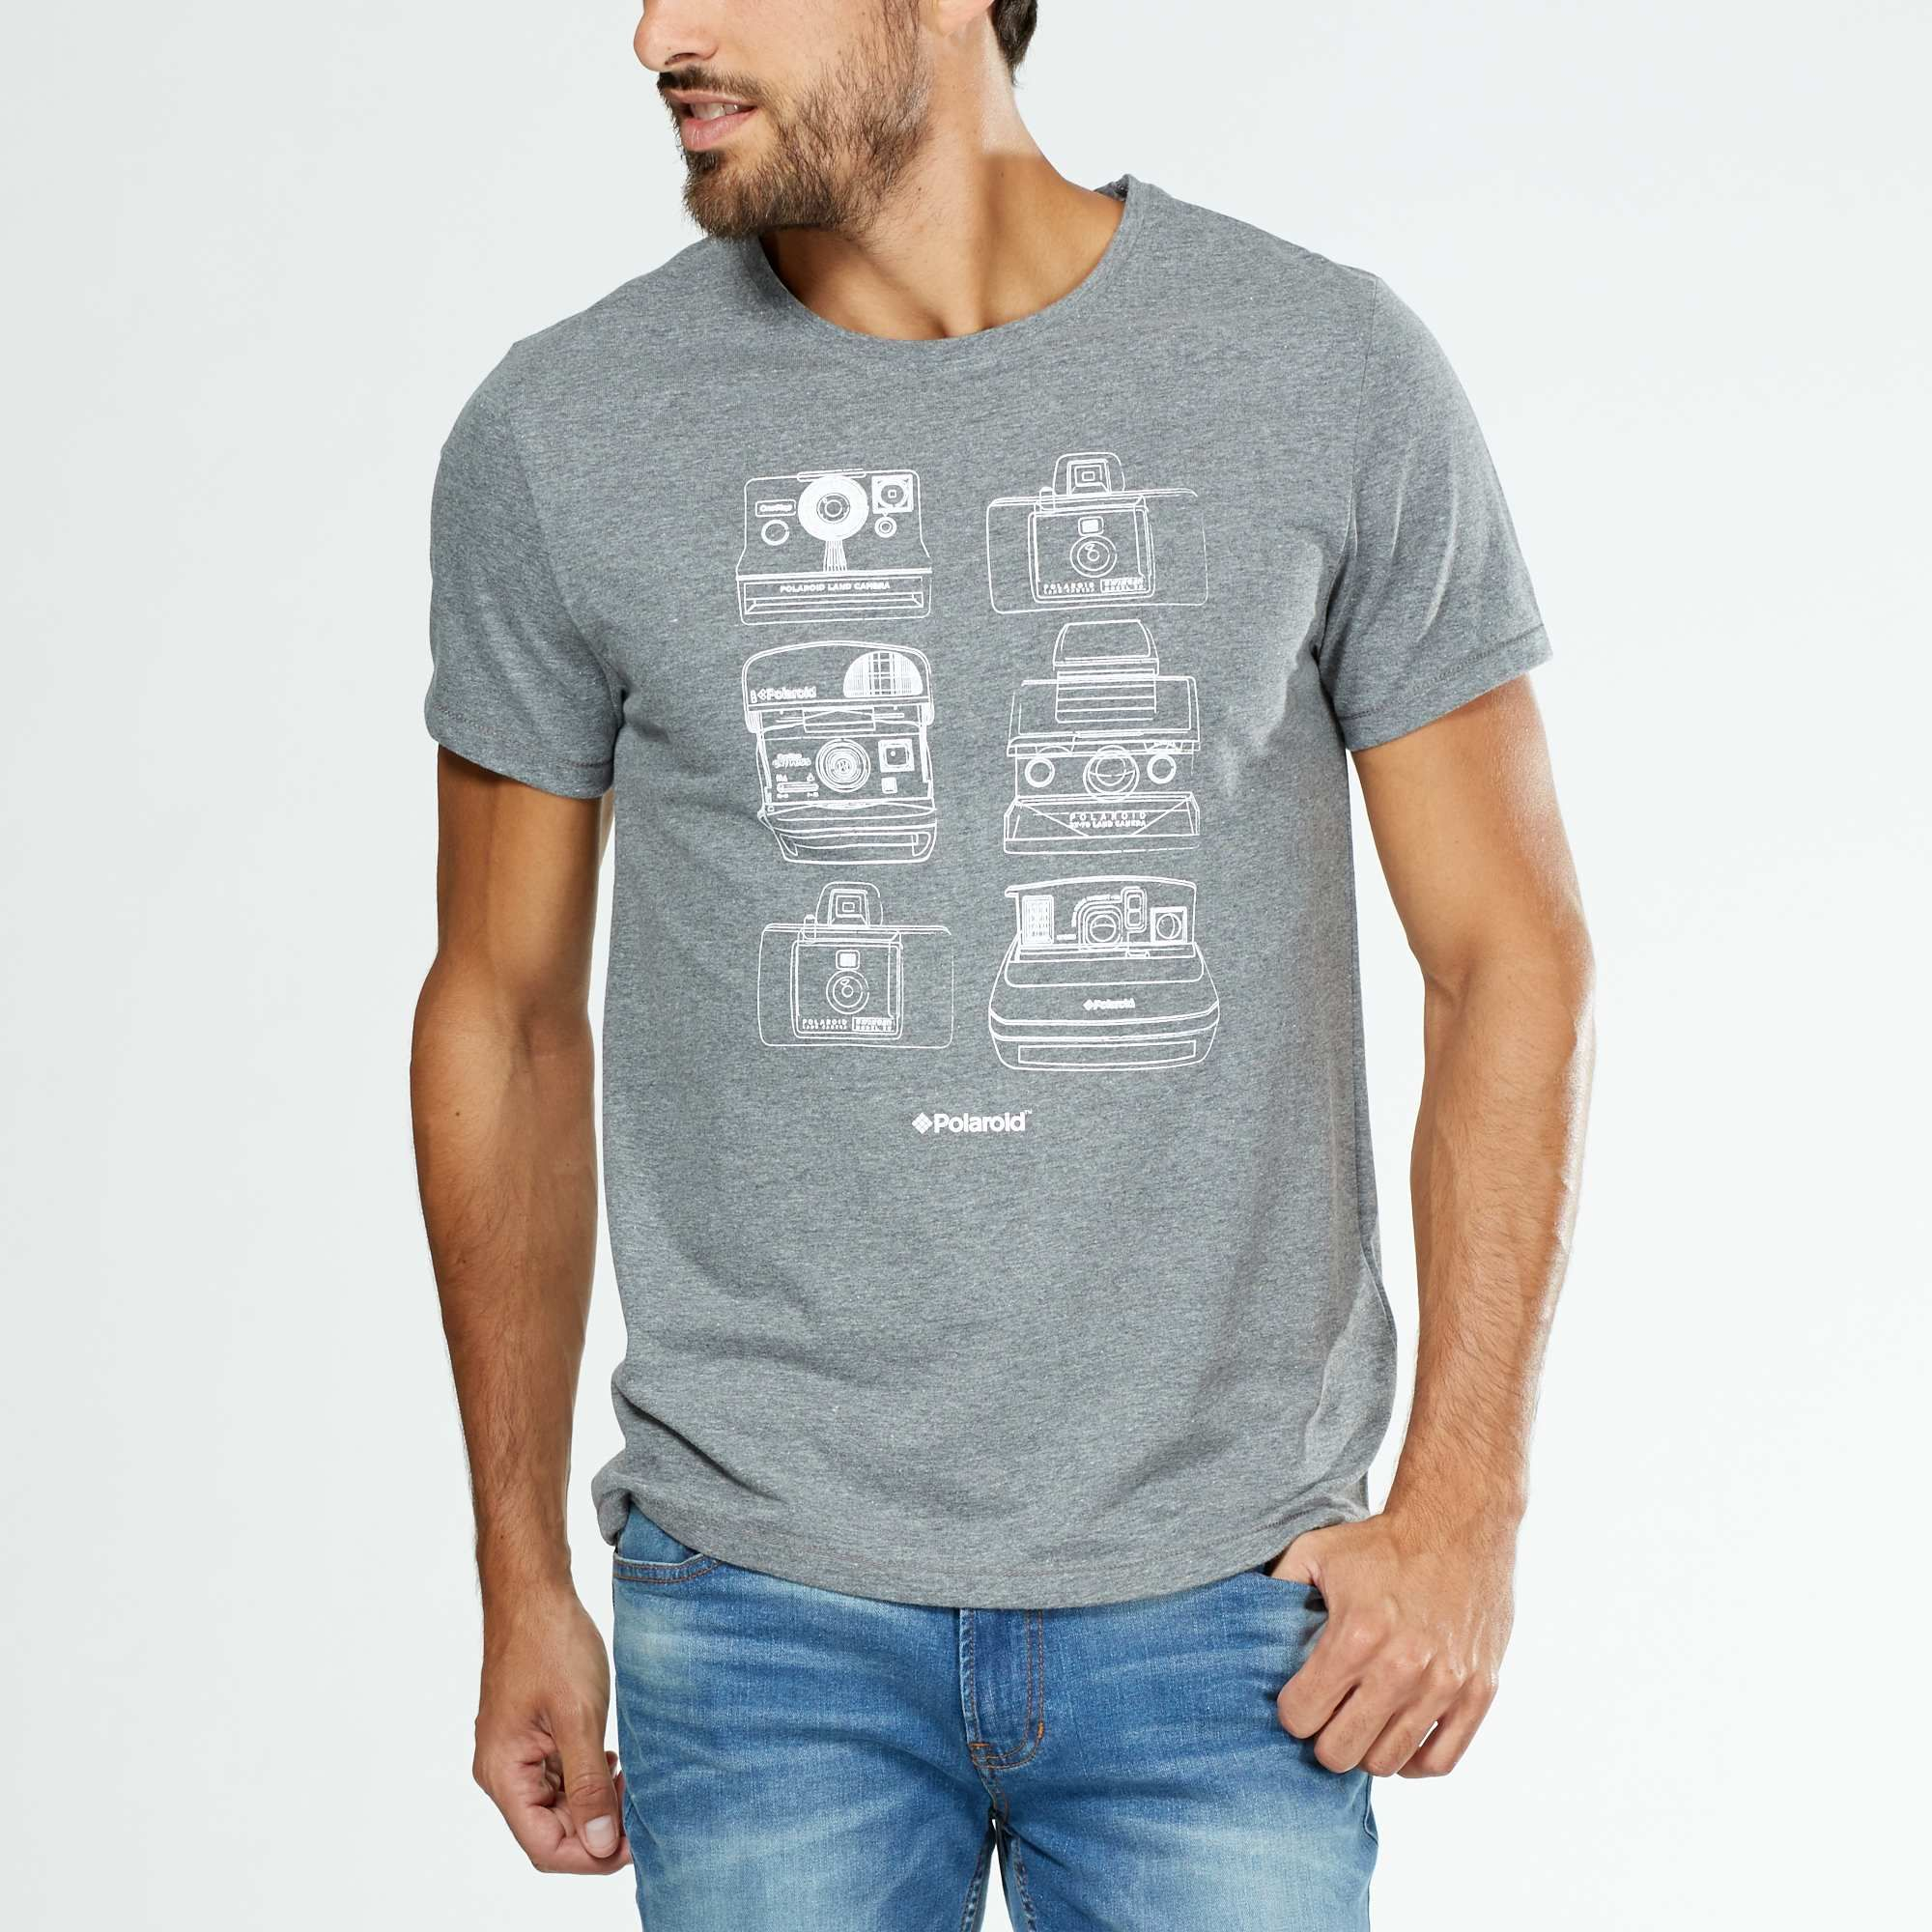 065e6929bec30 Tee-shirt  Polaroid  Homme - Kiabi - 6